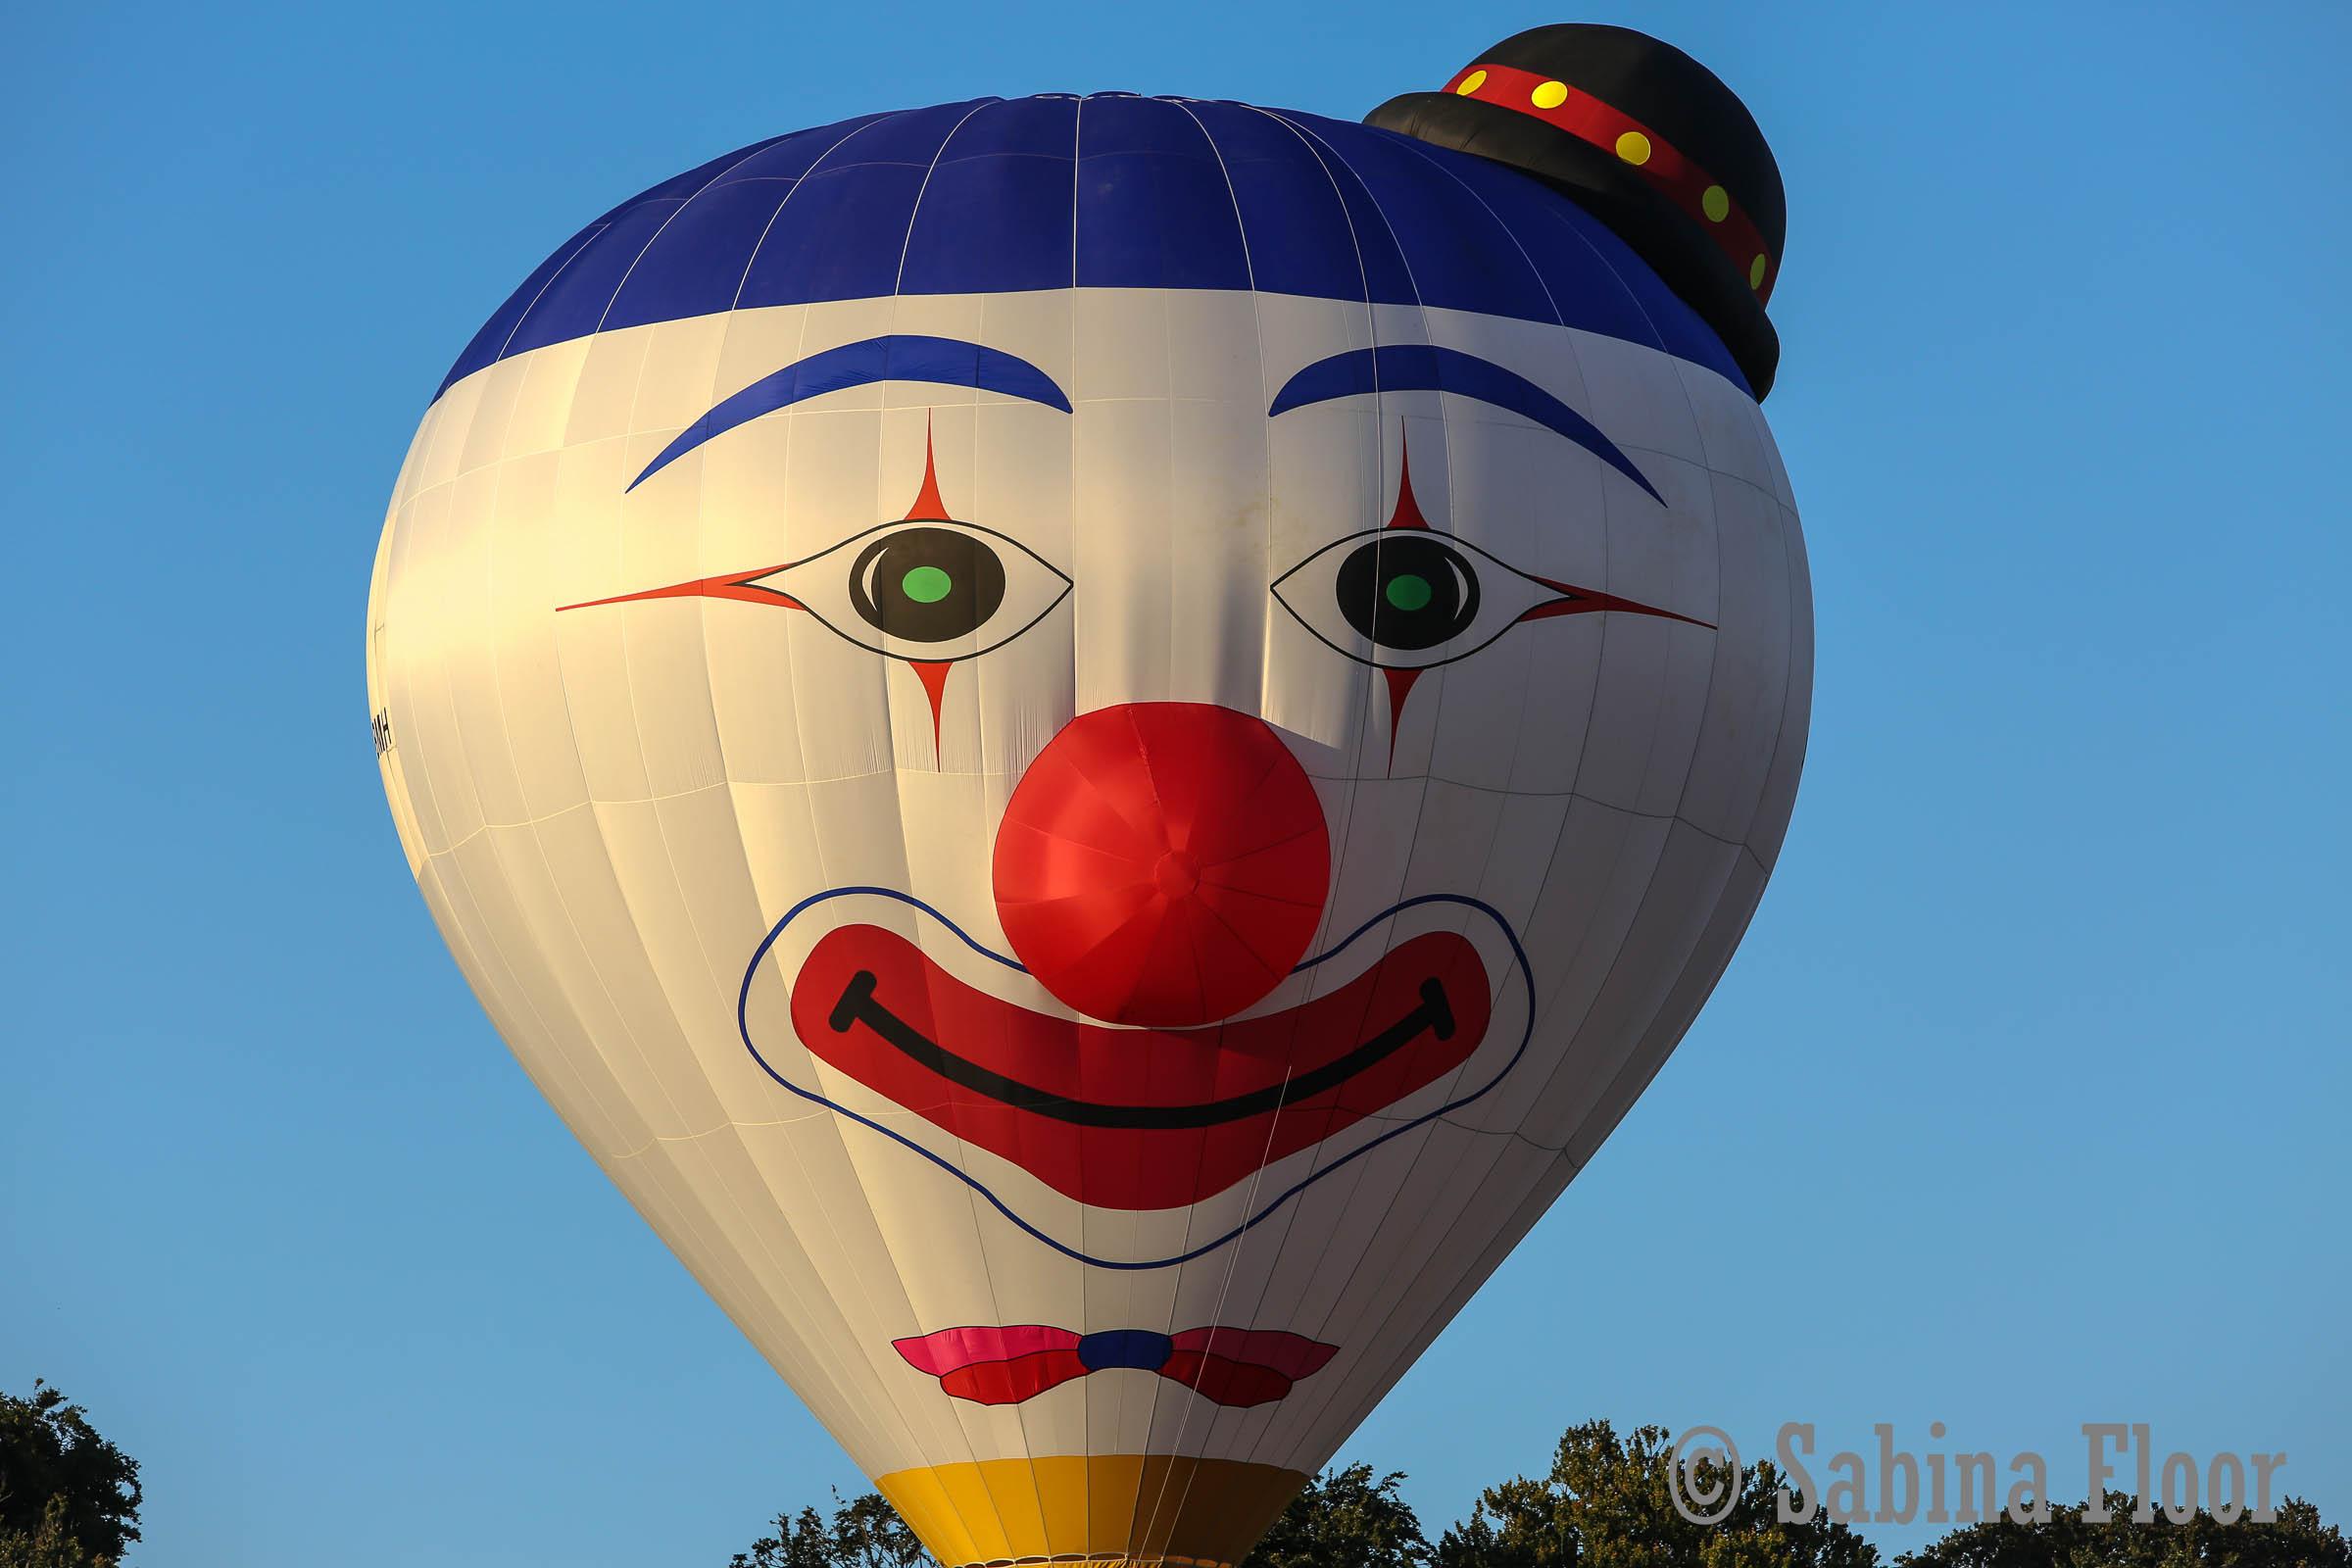 18 augustus 2016 – Ballonfestival Barneveld